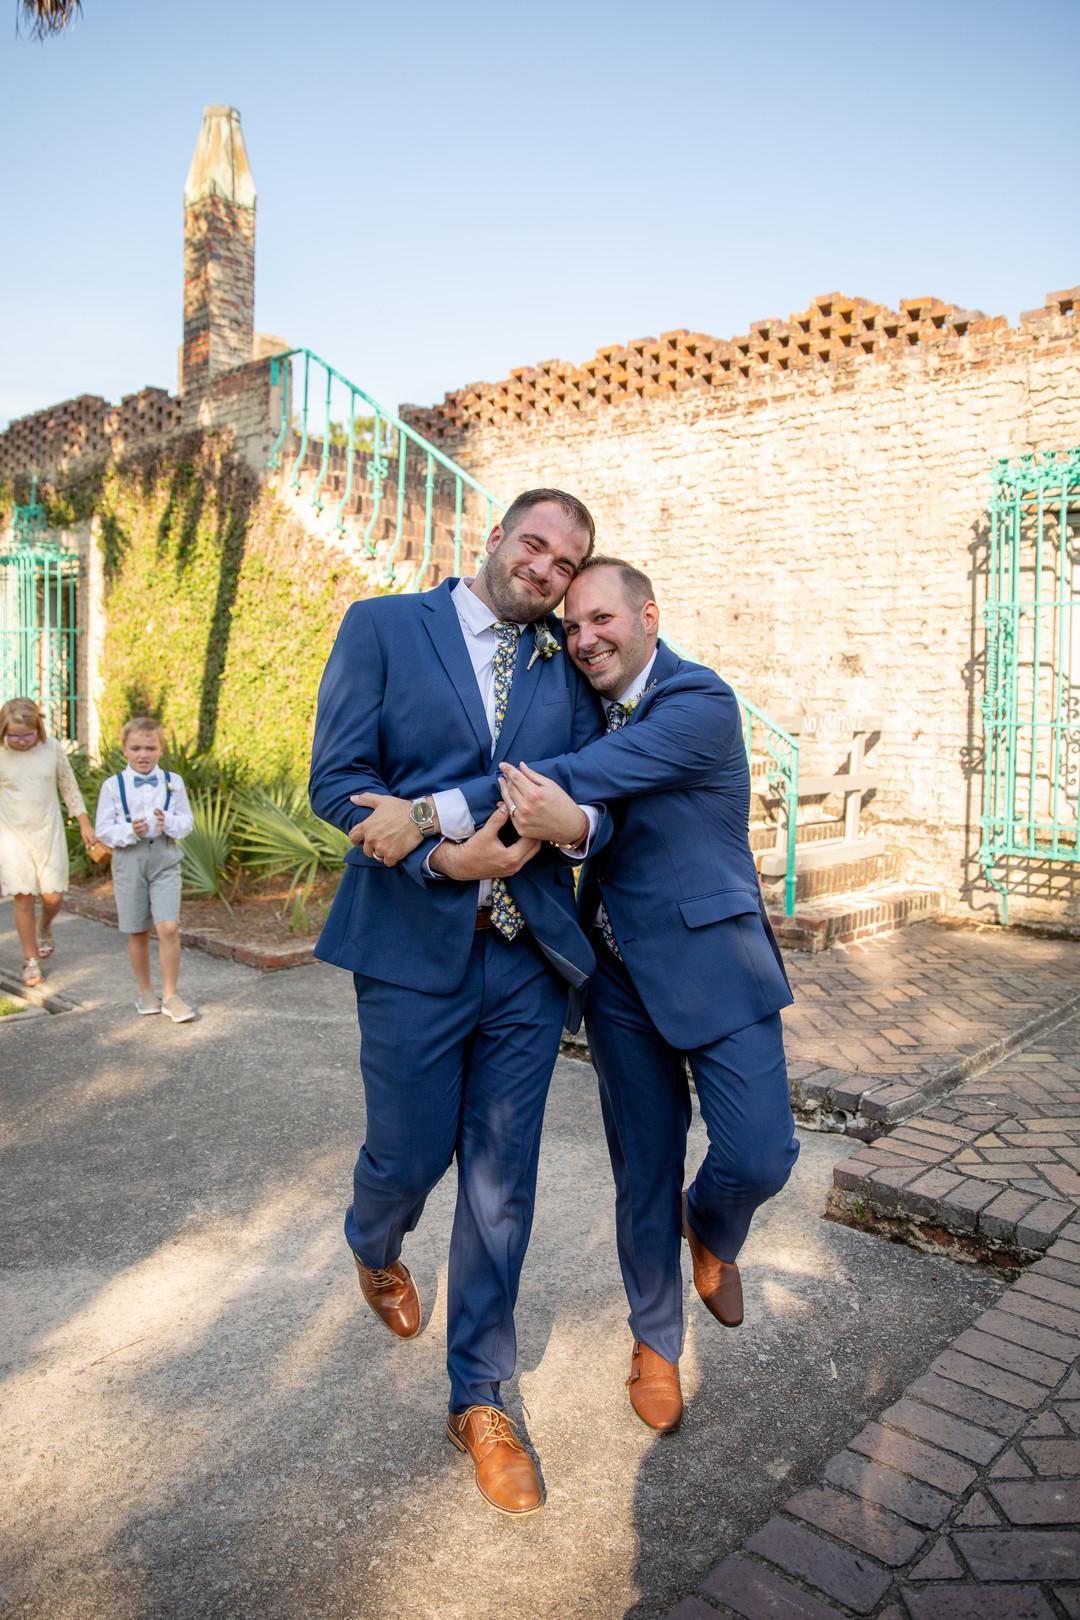 atalaya-castle-wedding-31.jpg